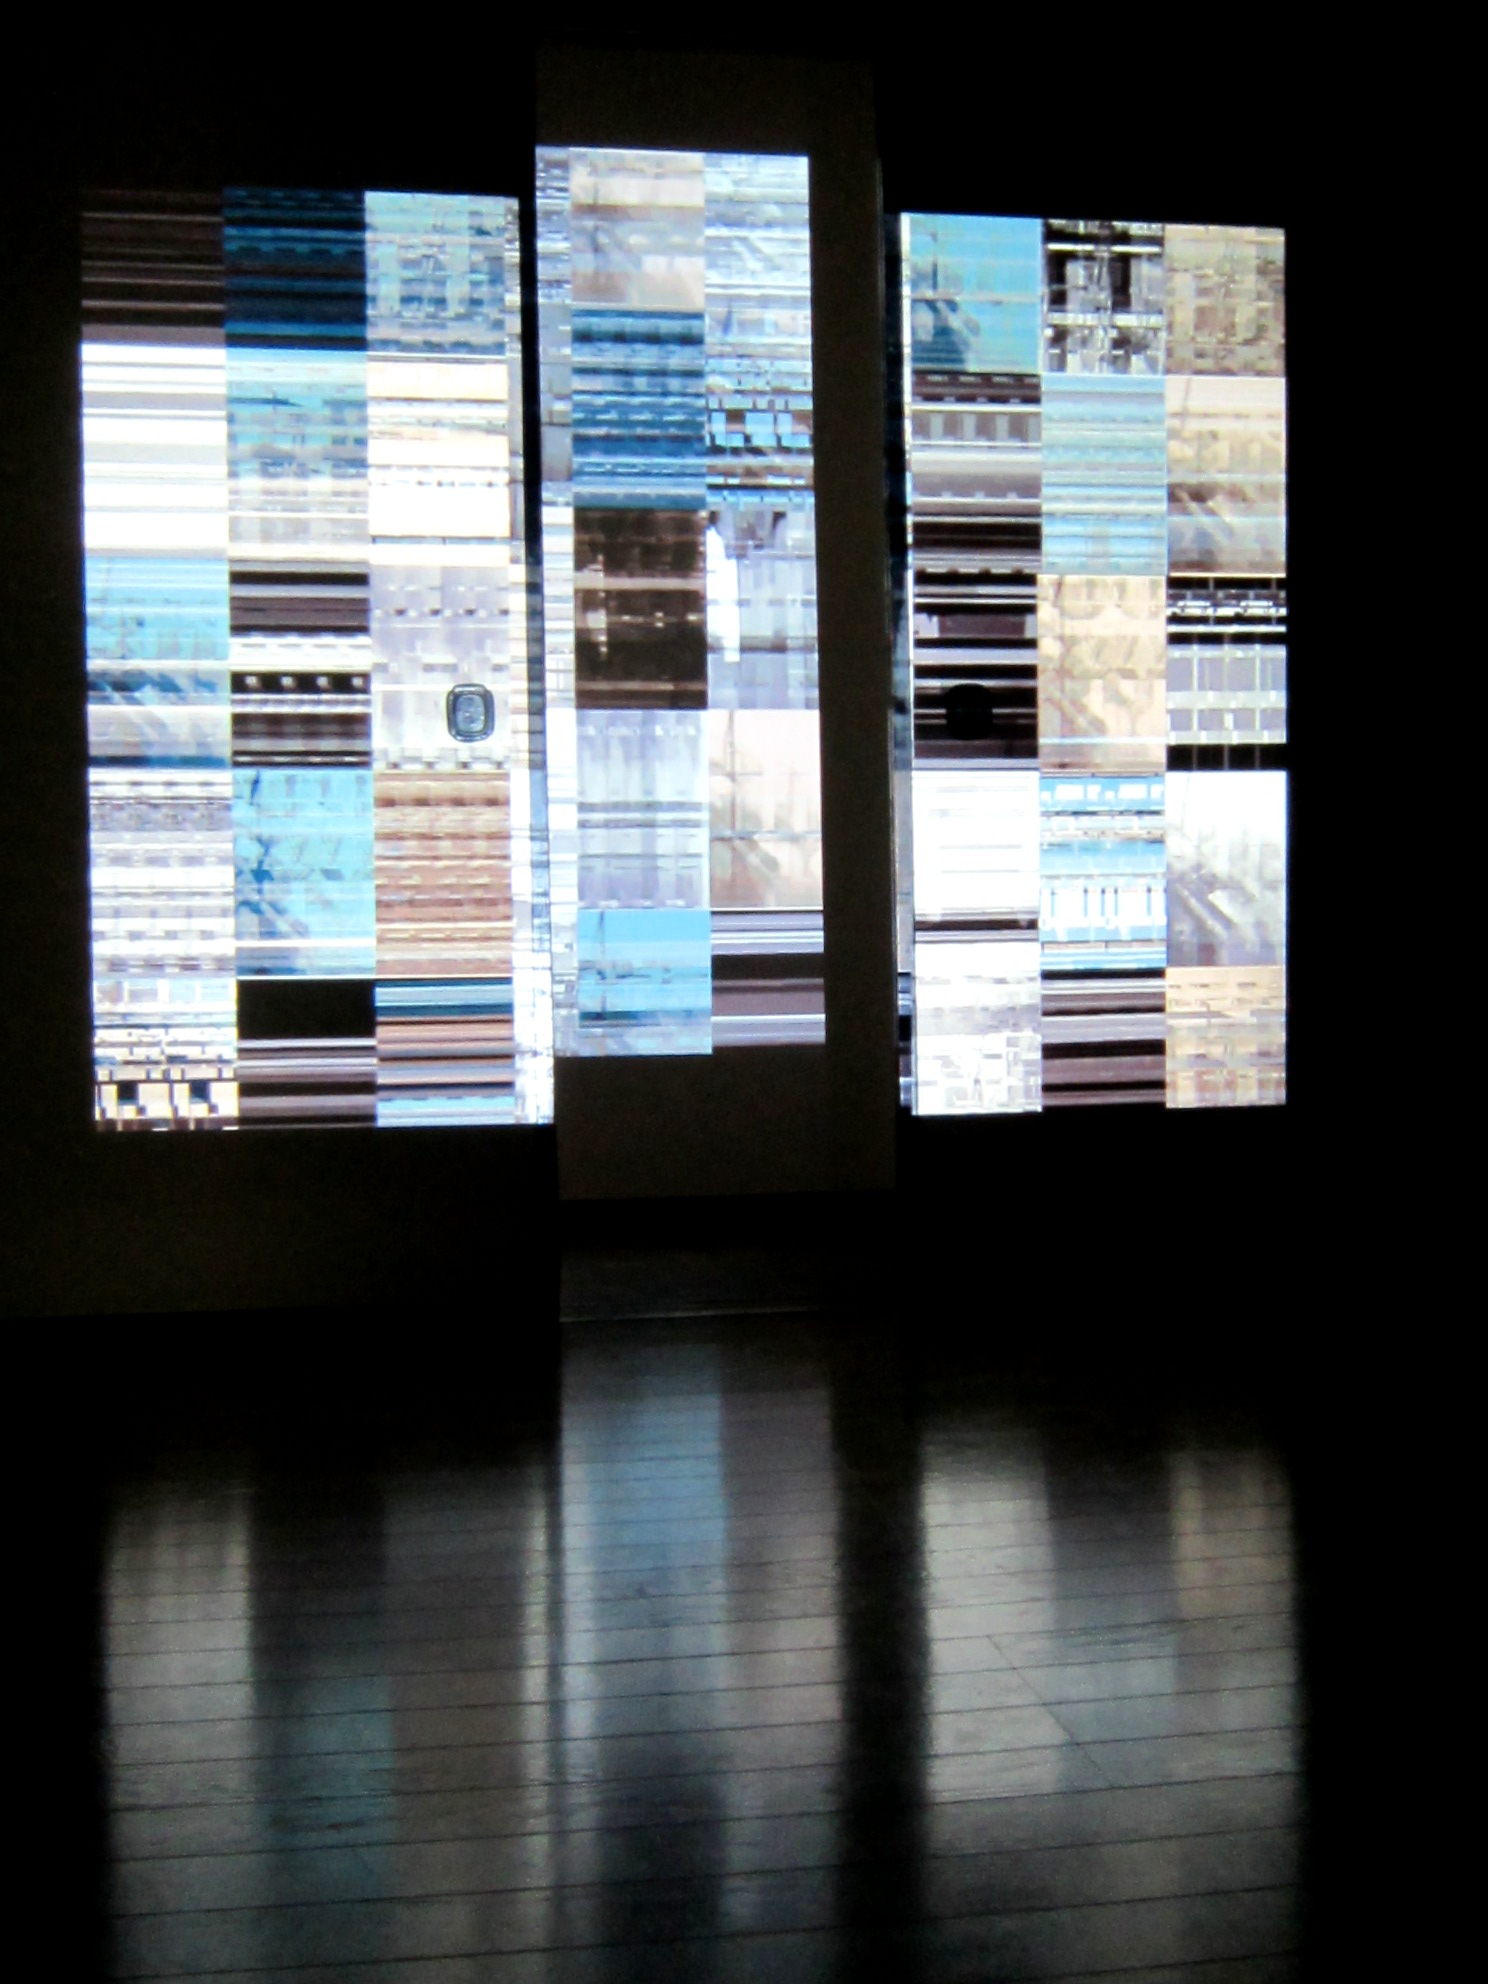 2035)「上野麗市 個展 『De\'tente デタント』」 g.犬養 4月17日(水)~4月29日(月)_f0126829_975270.jpg